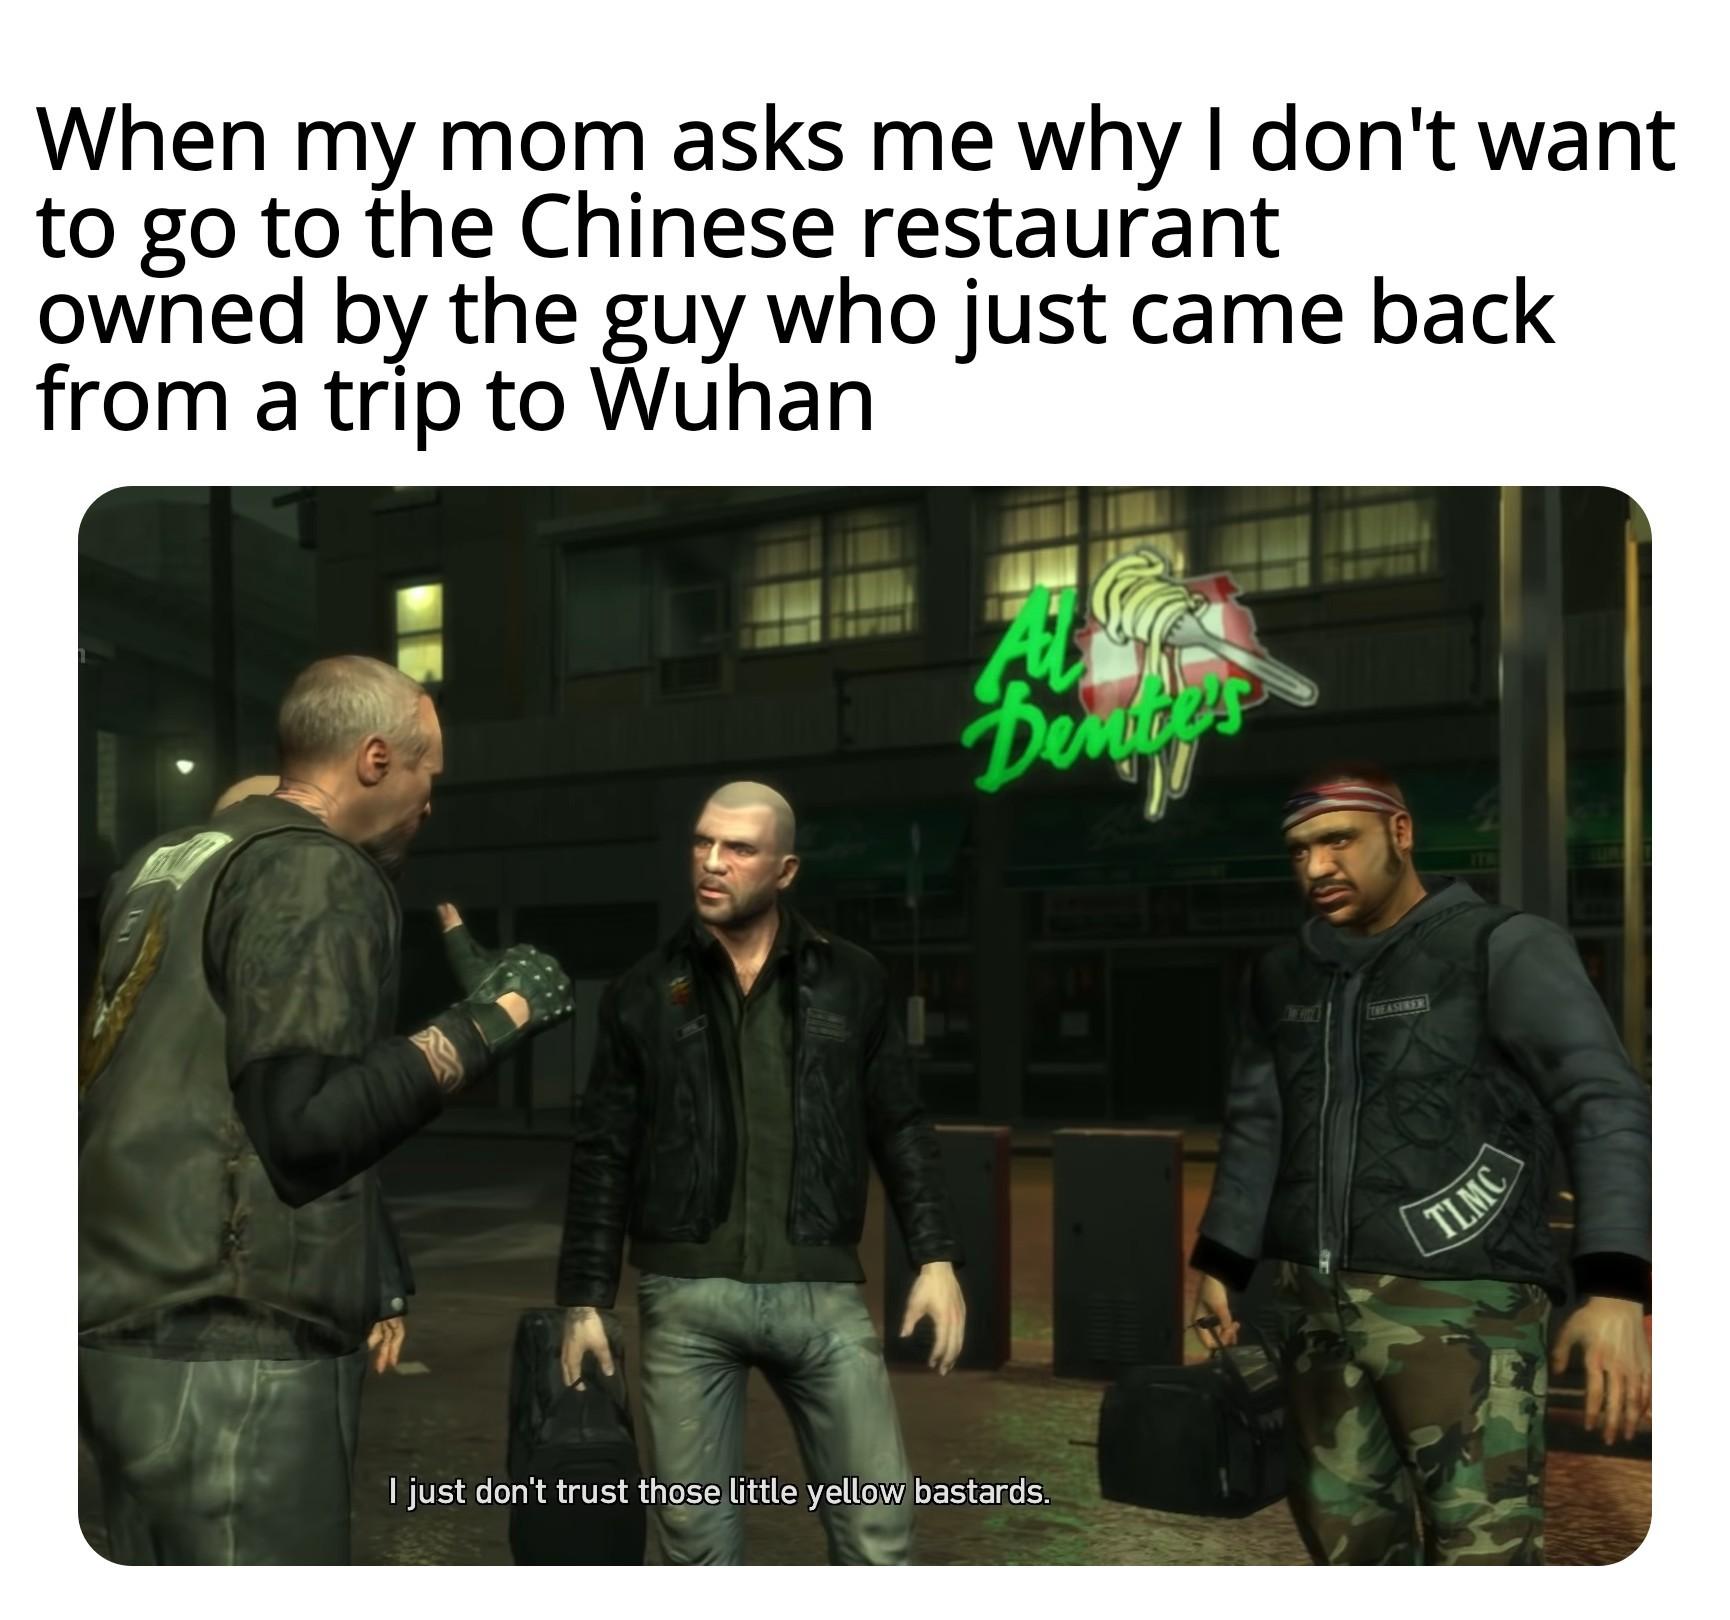 Dongs in a little yellow bastard - meme